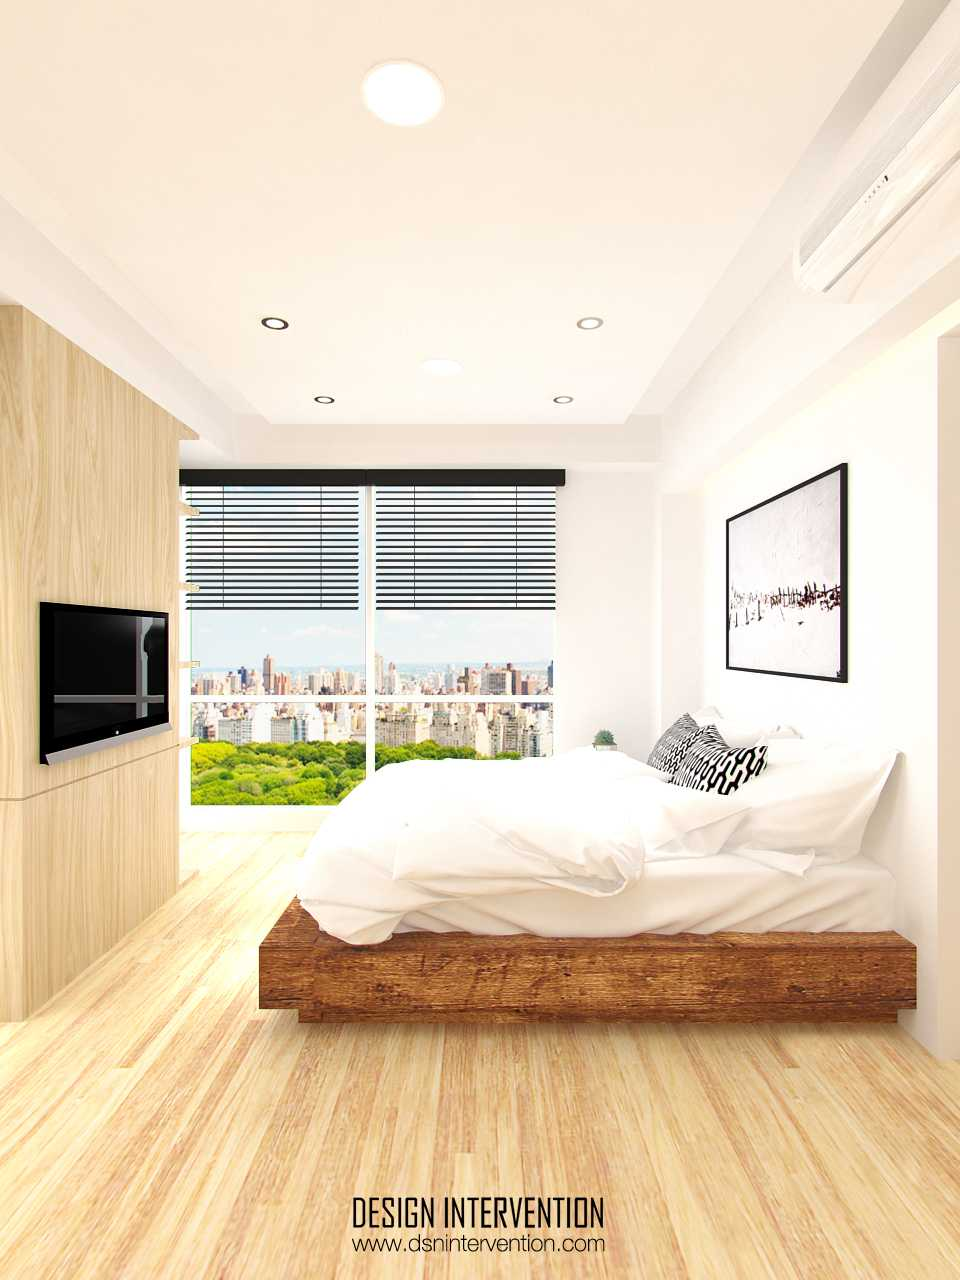 Foto inspirasi ide desain apartemen industrial Bedroom view oleh DESIGN INTERVENTION di Arsitag